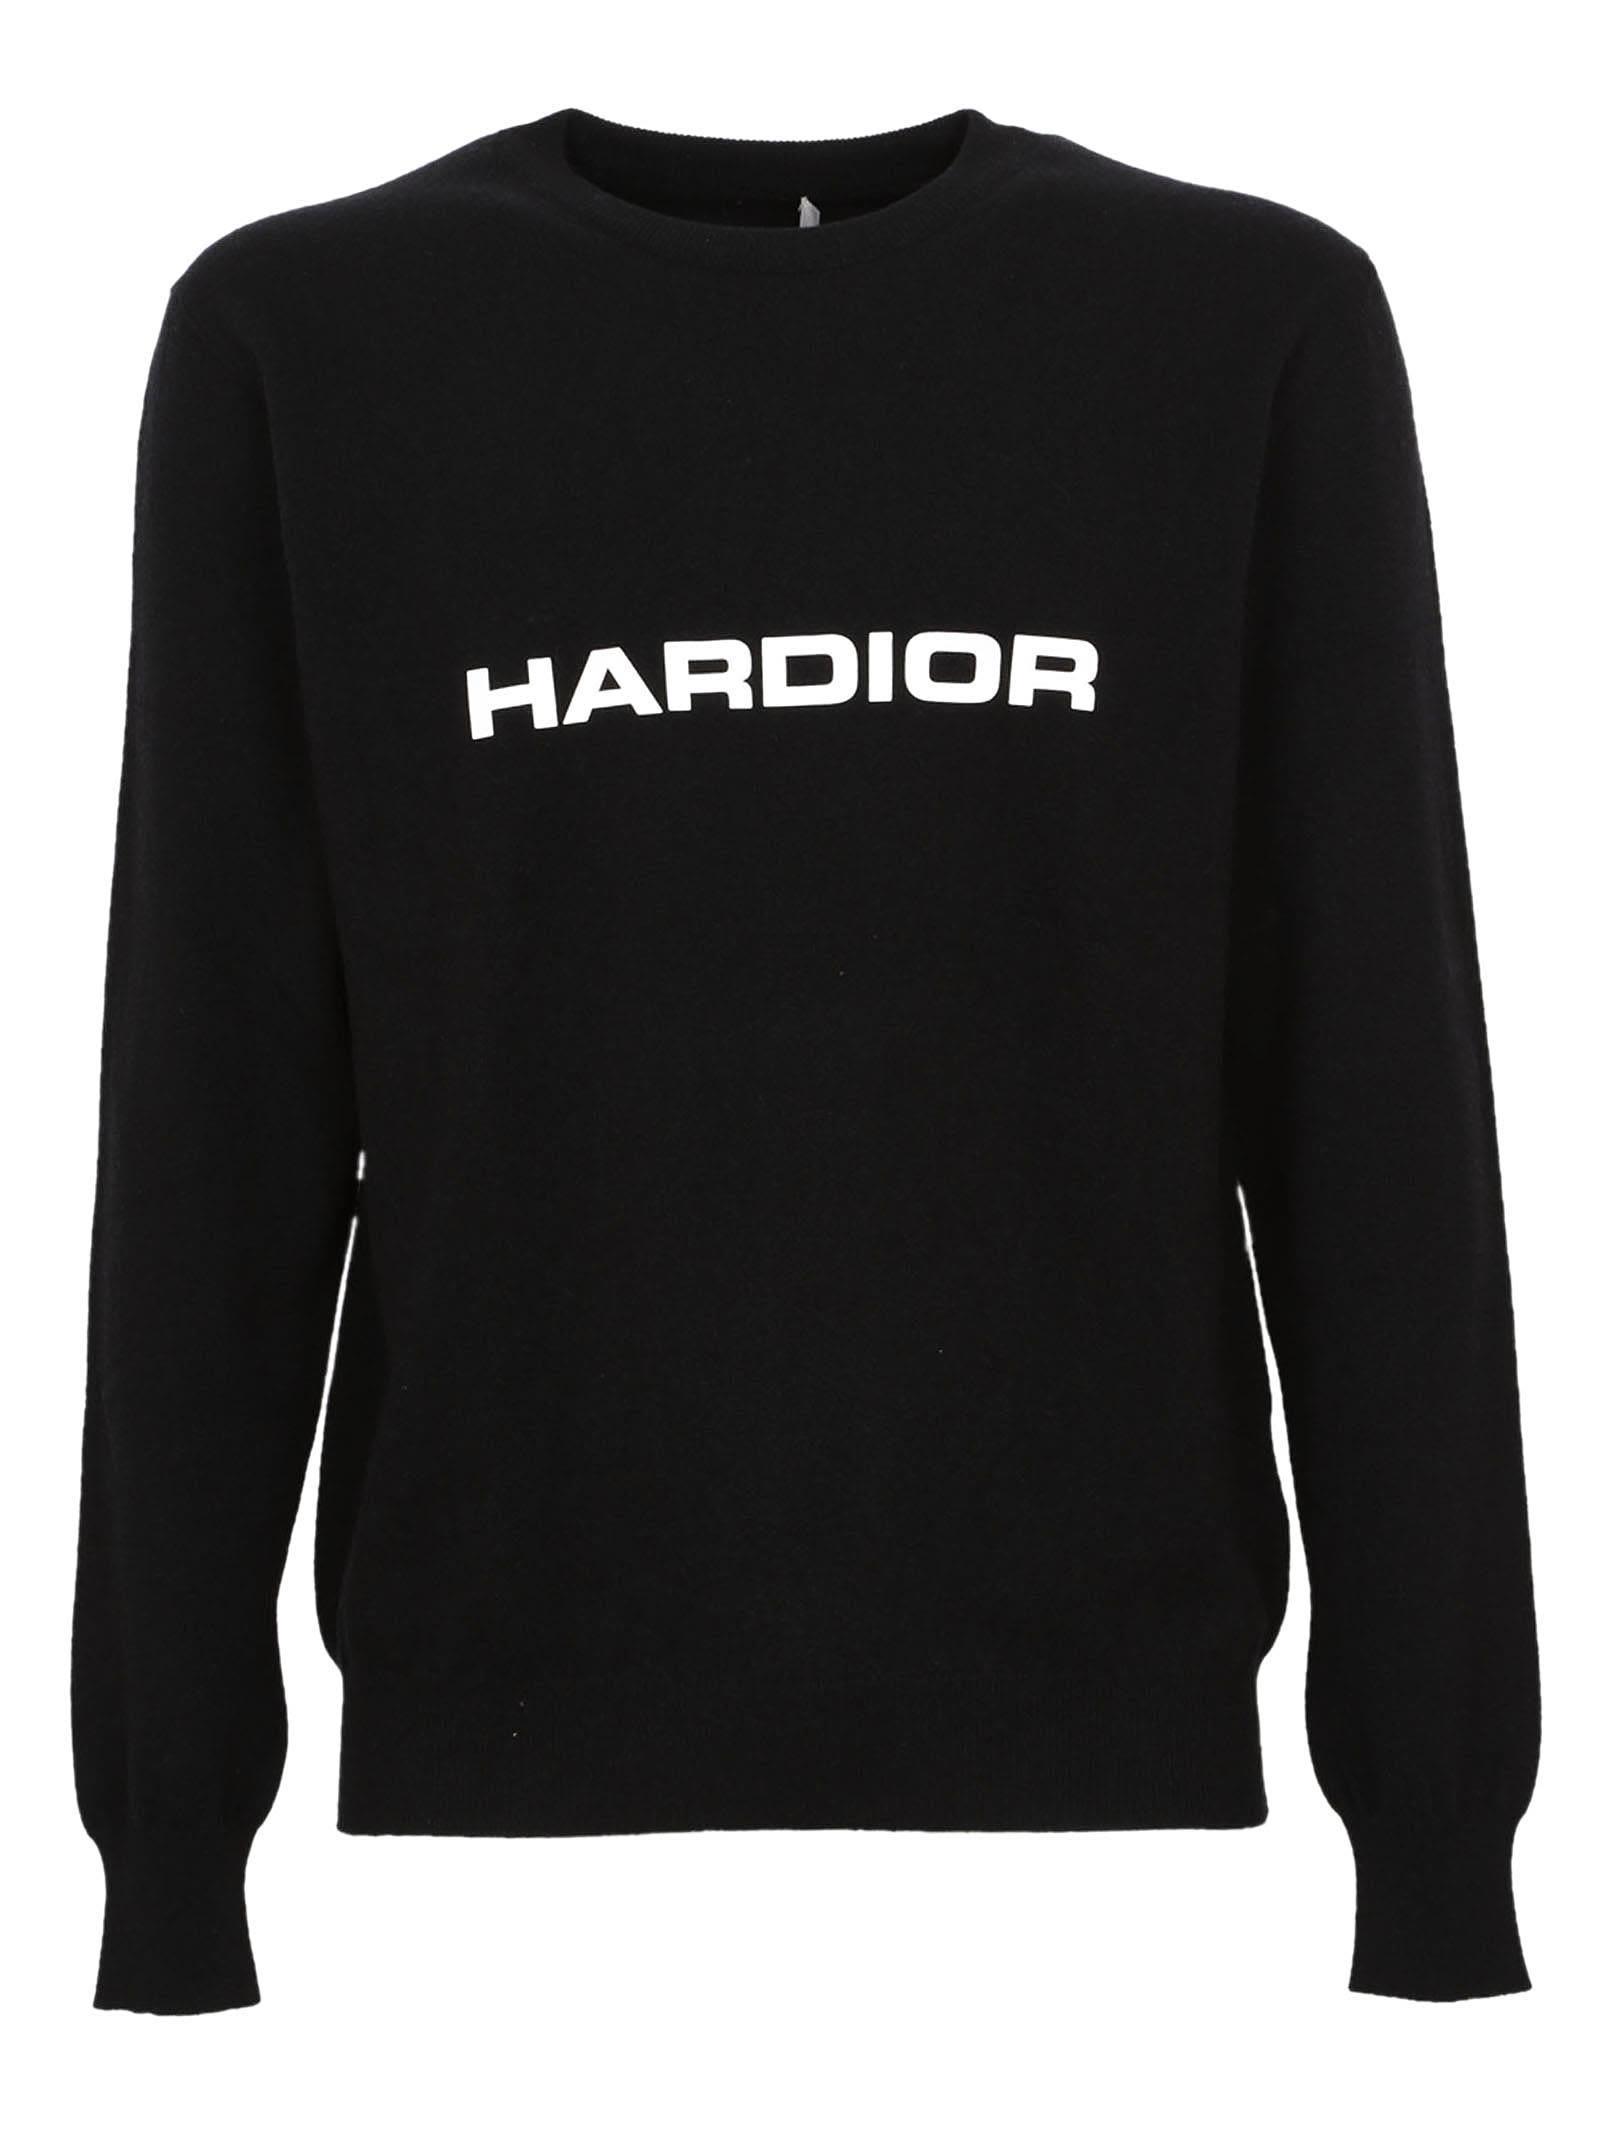 b911b62825b Dior Homme Hardior Print Sweater In Black